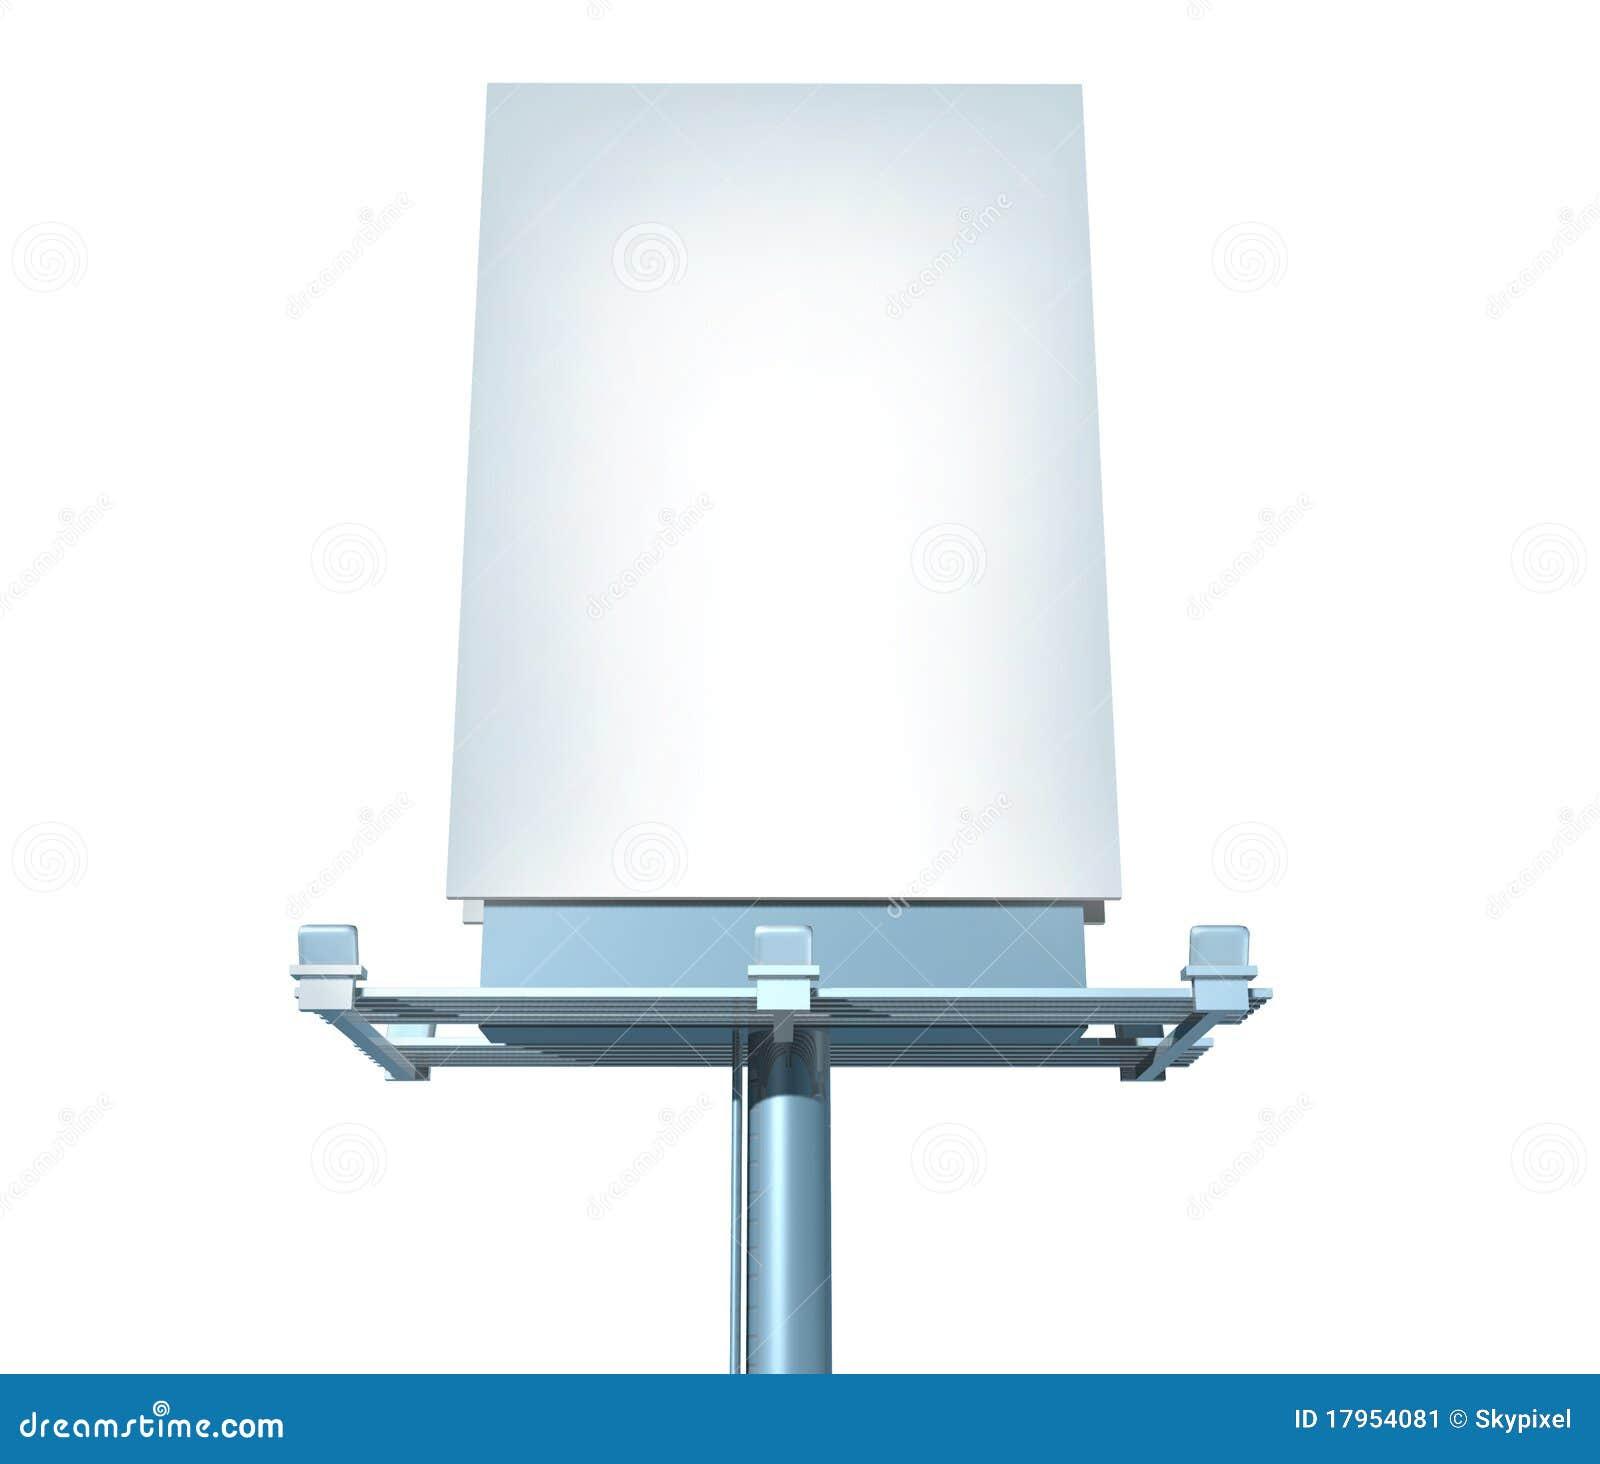 Billboard Vertical Angled Outdoor Display Stock Image - Image ...